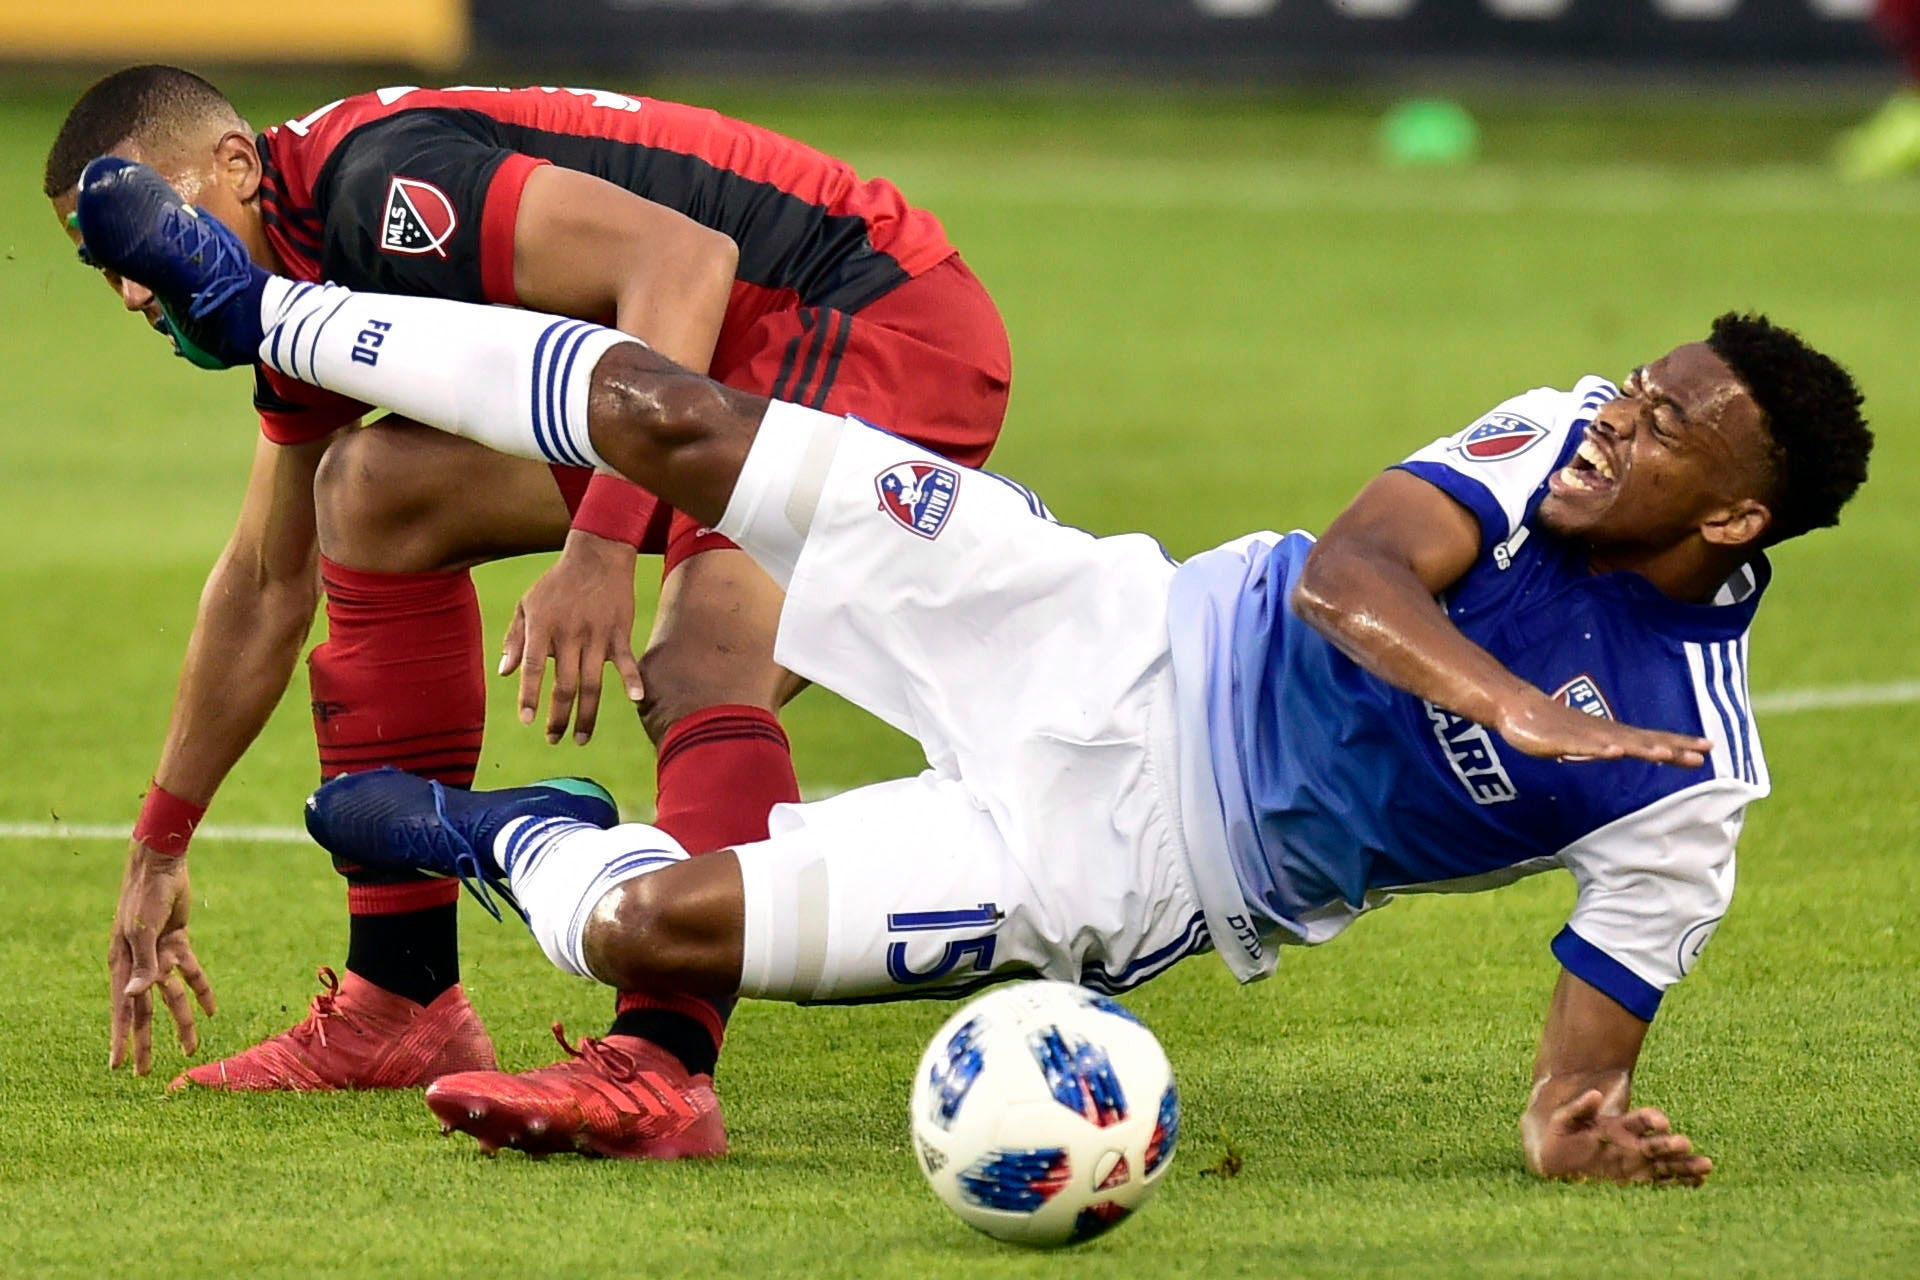 FC Dallas beats Toronto FC 1-0 behind Urruti, Gonzalez